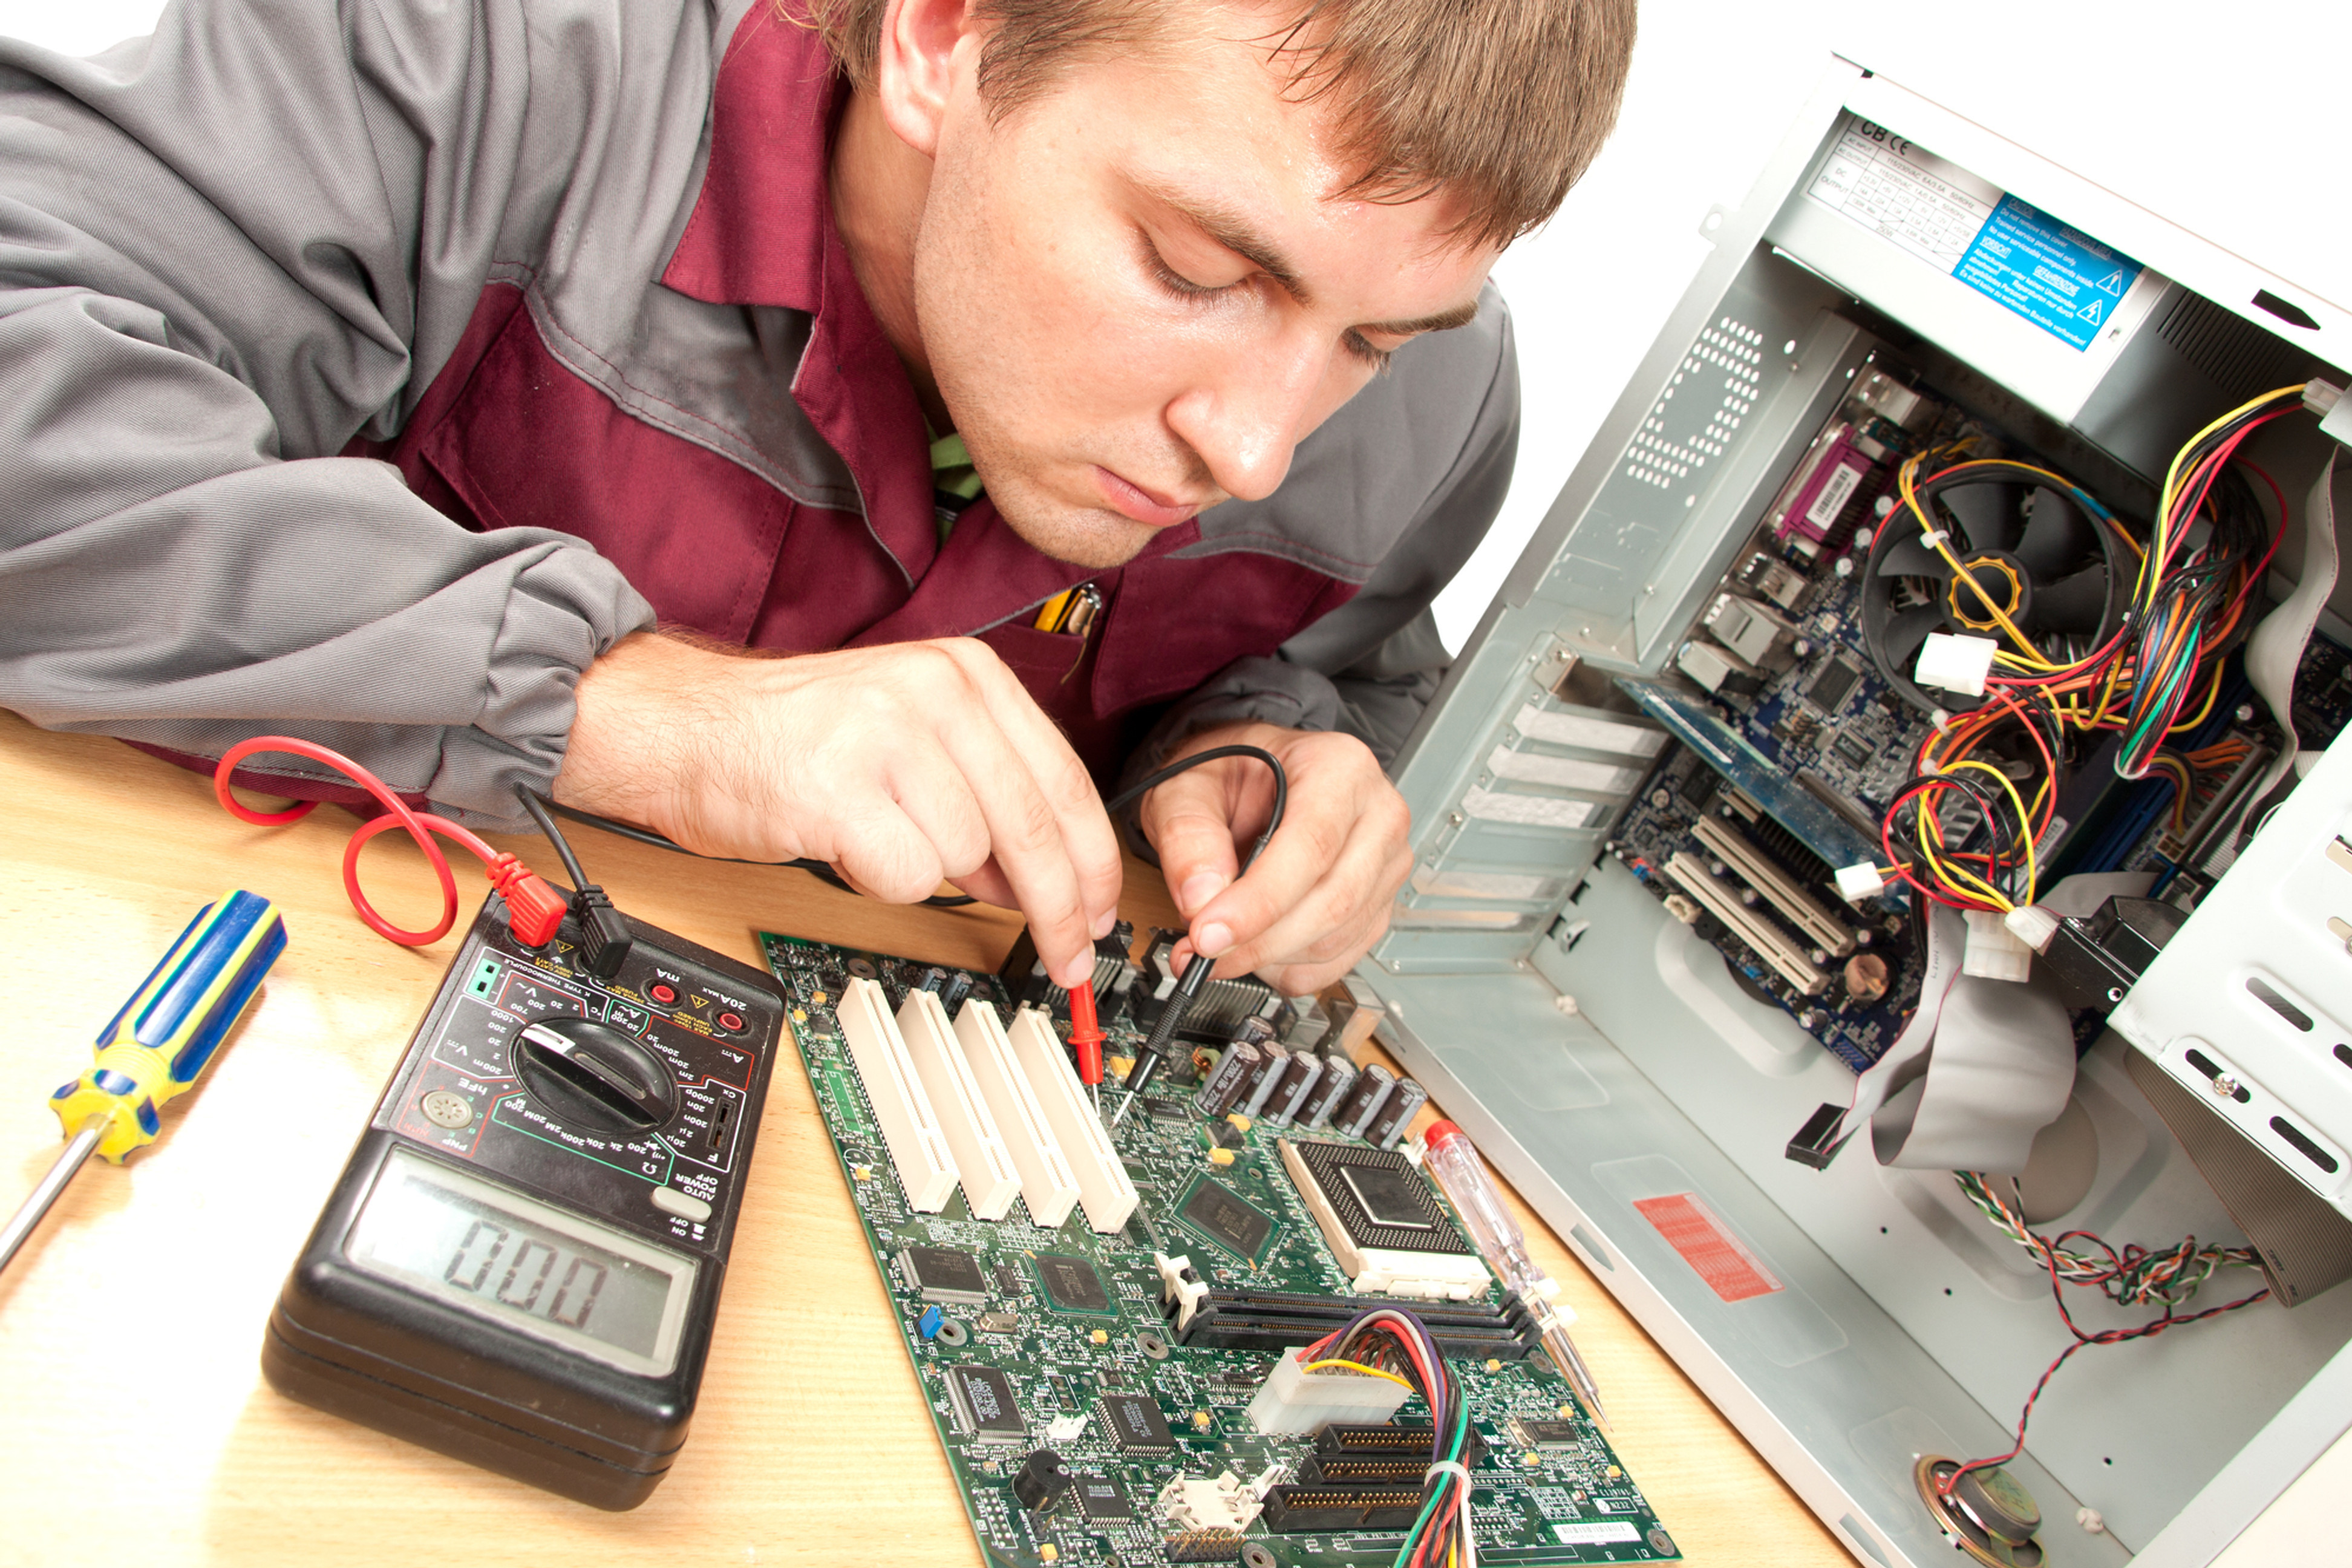 Diagnostics / repairs call-out